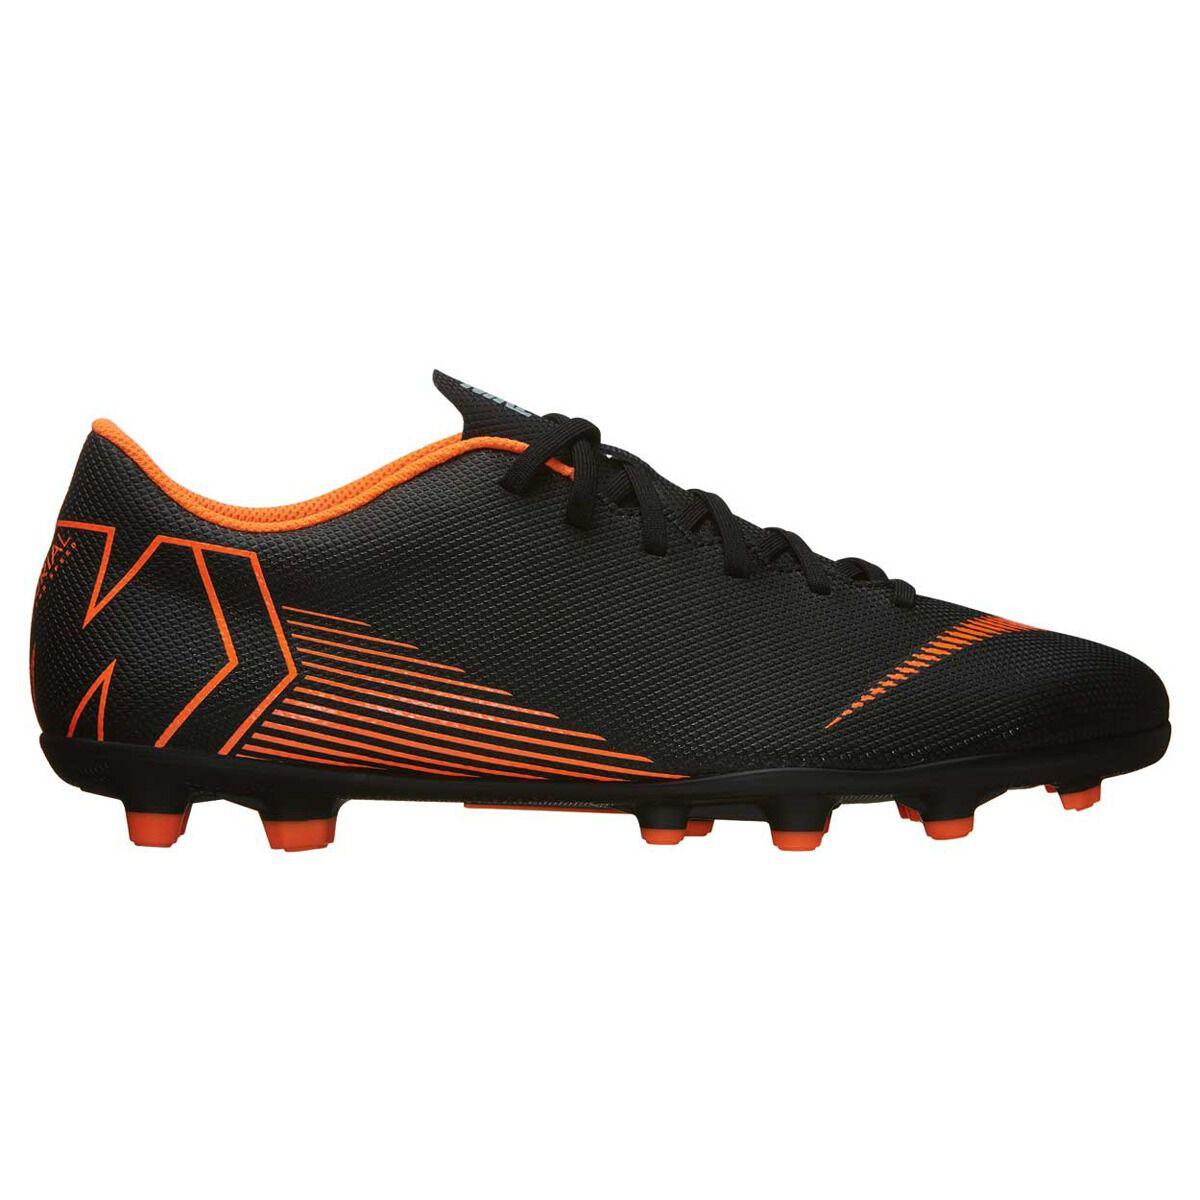 05d554ac1e97 discount nike mercurial vapor 12 club mg mens football boots black orange  us 7 adult 581b3